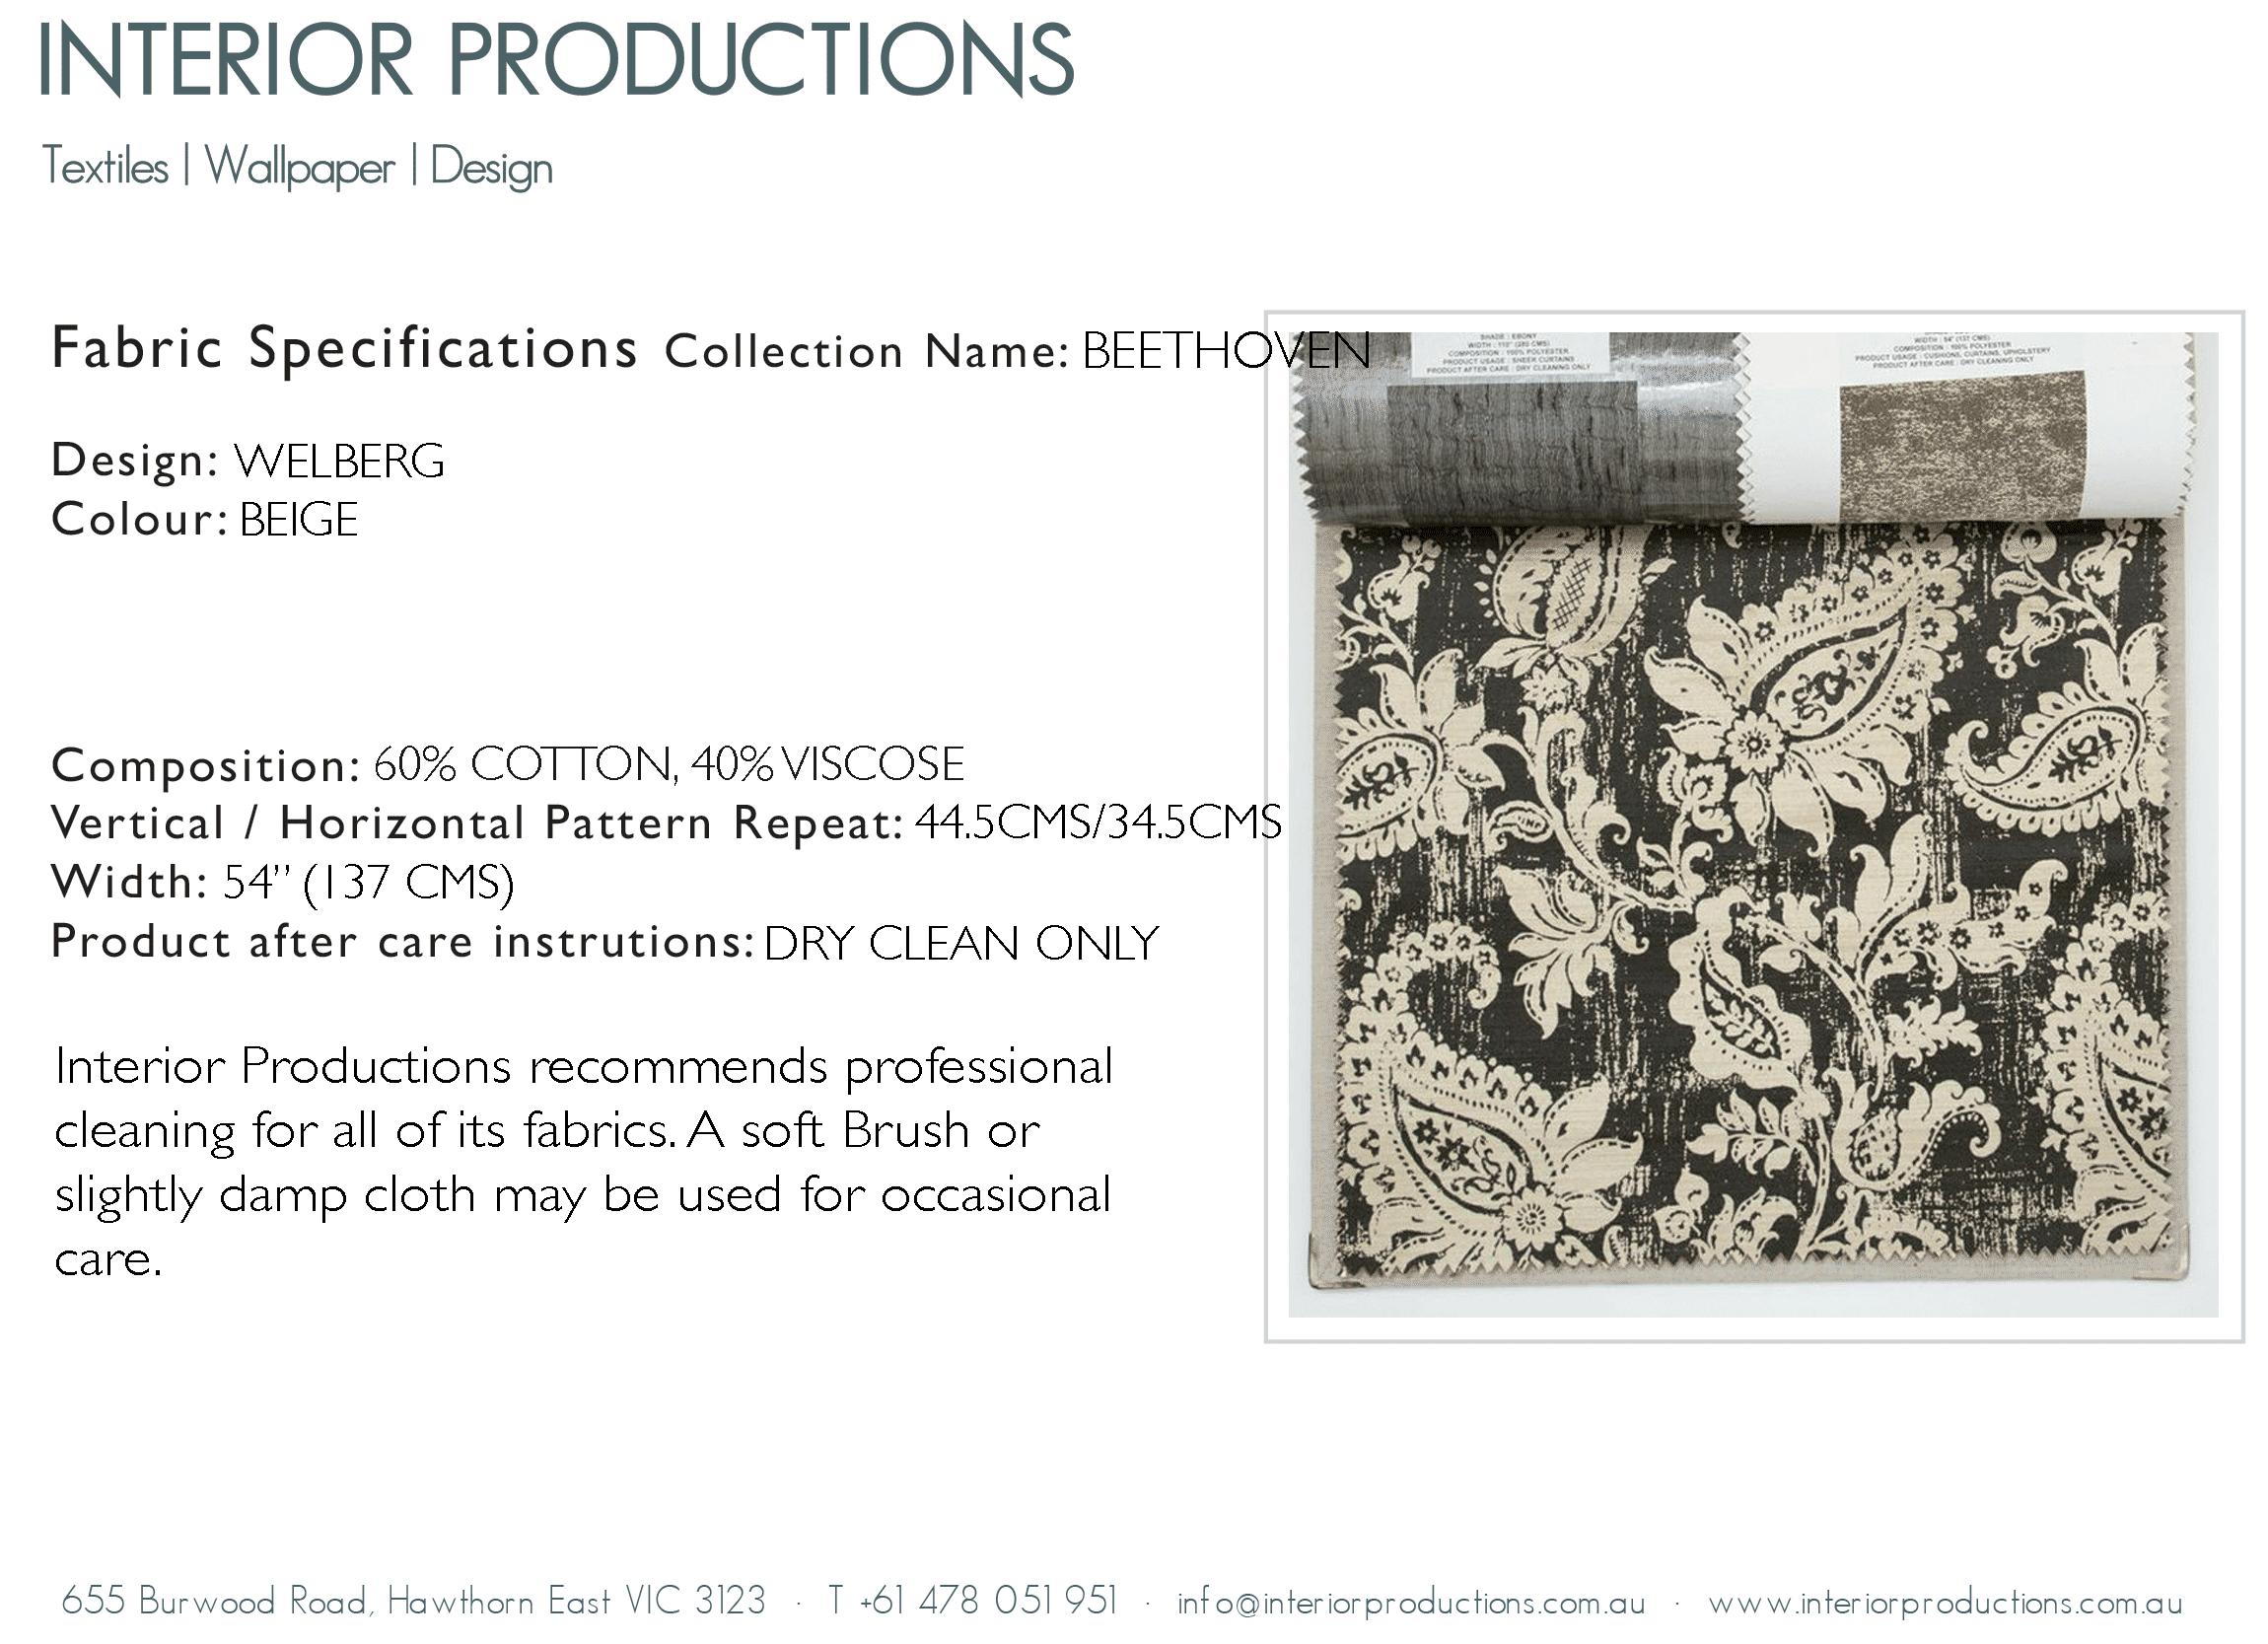 interior_productions_WELBERG---BEIGE